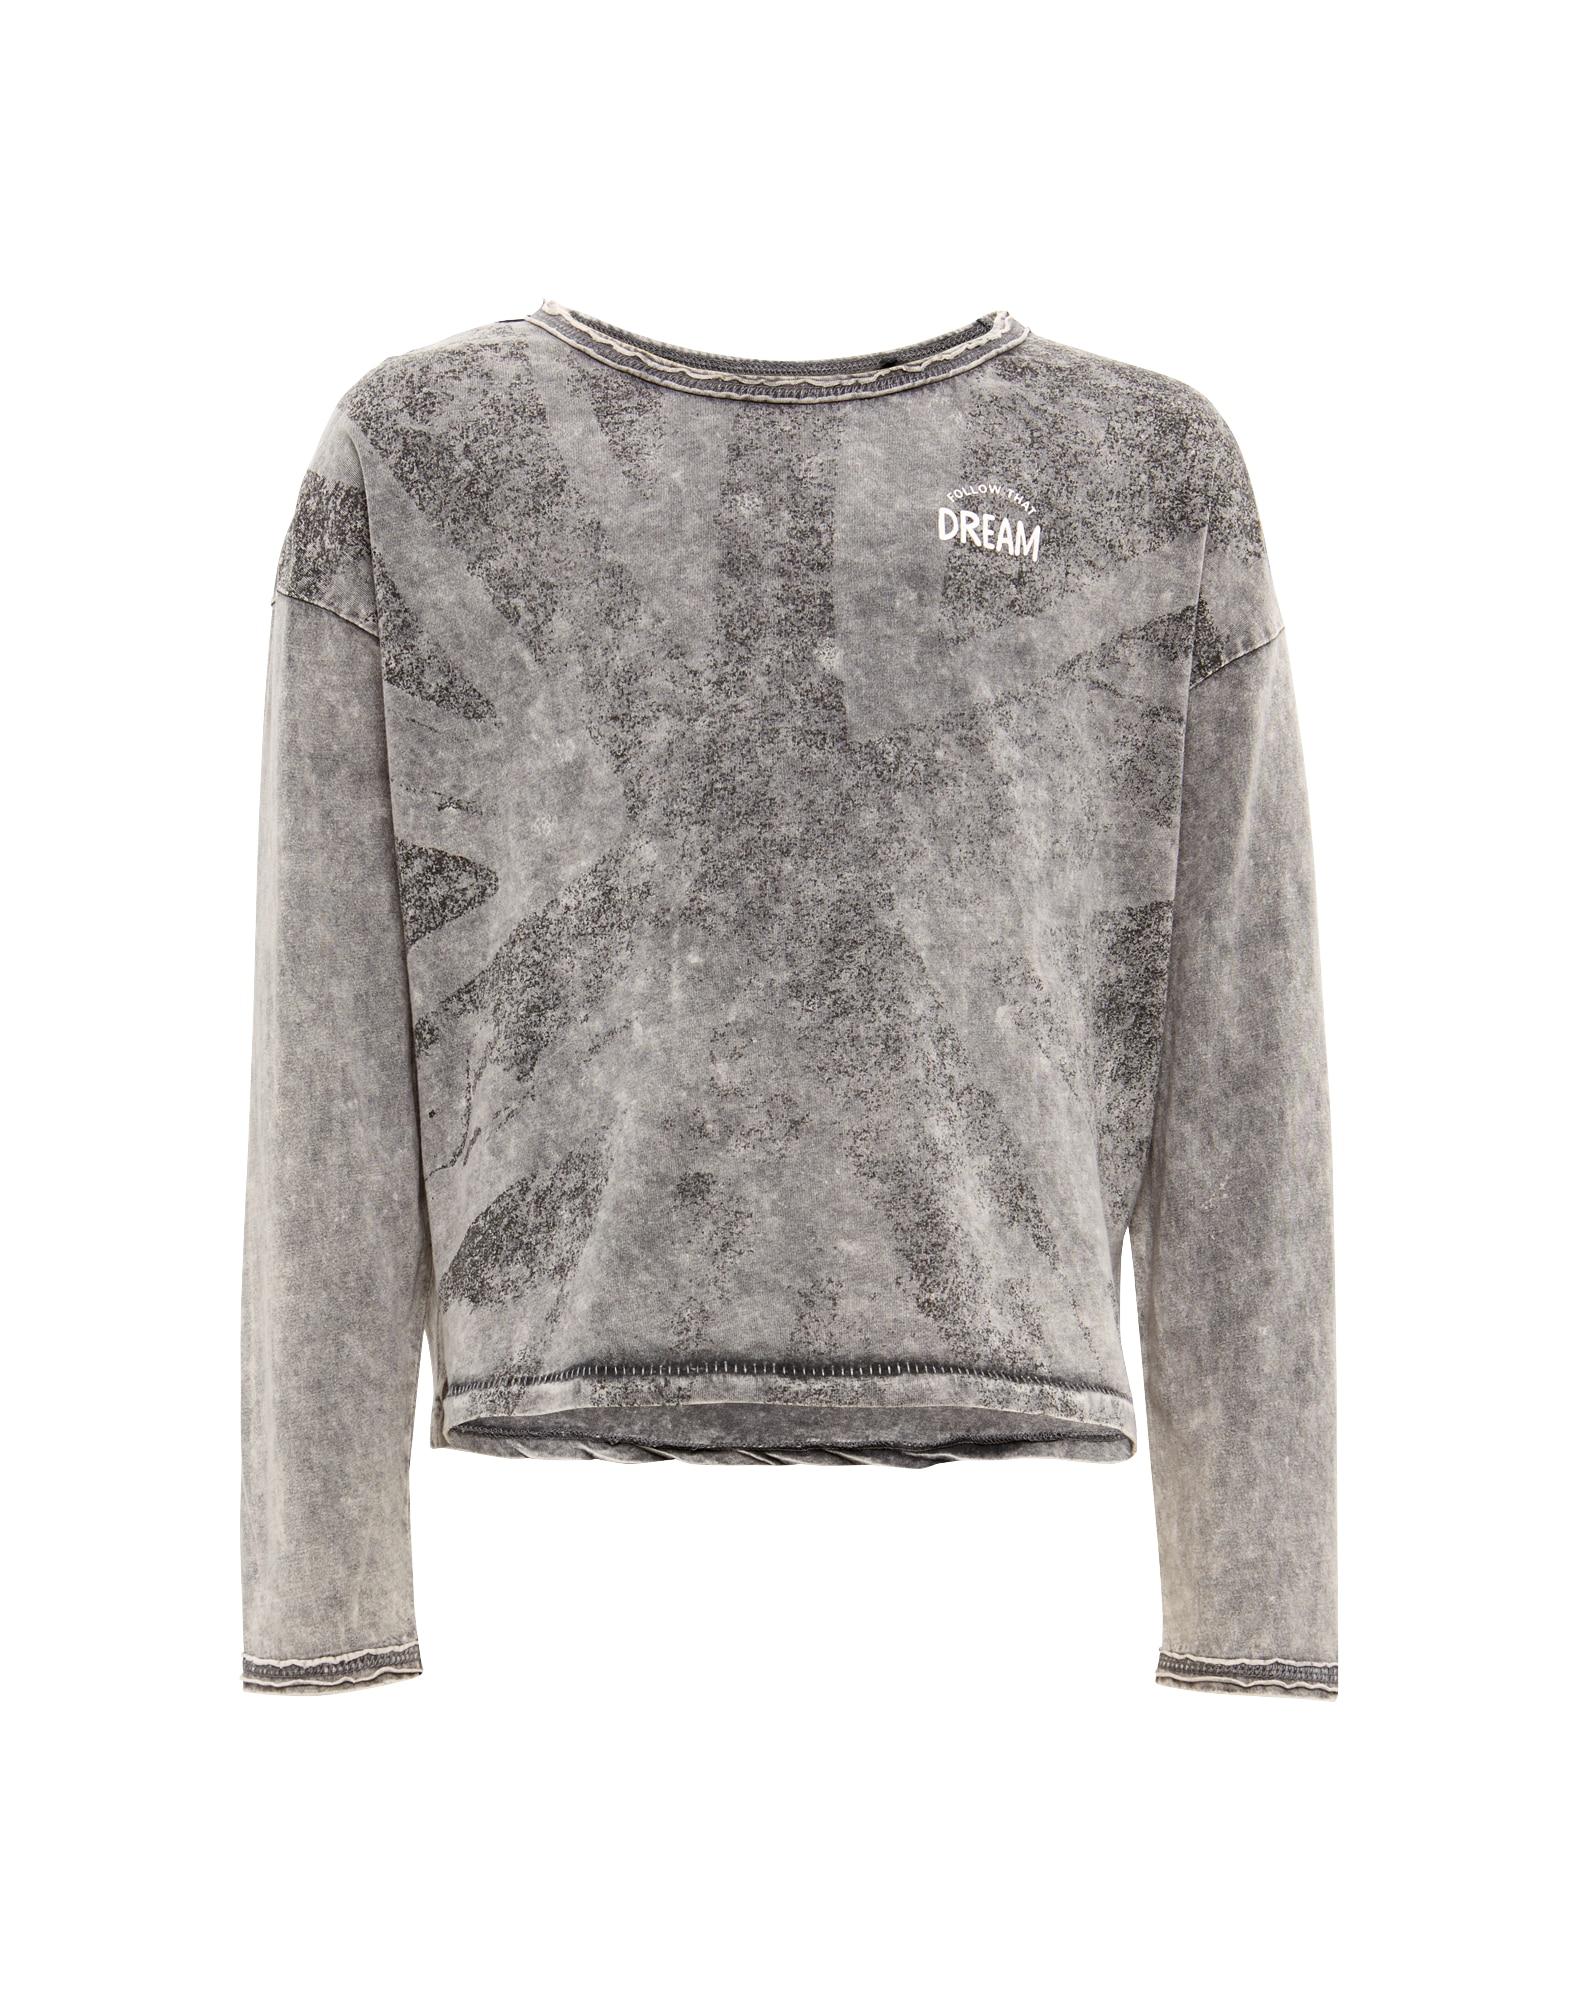 Pepe Jeans Meisjes Shirt CONSTANCE TEEN grijs